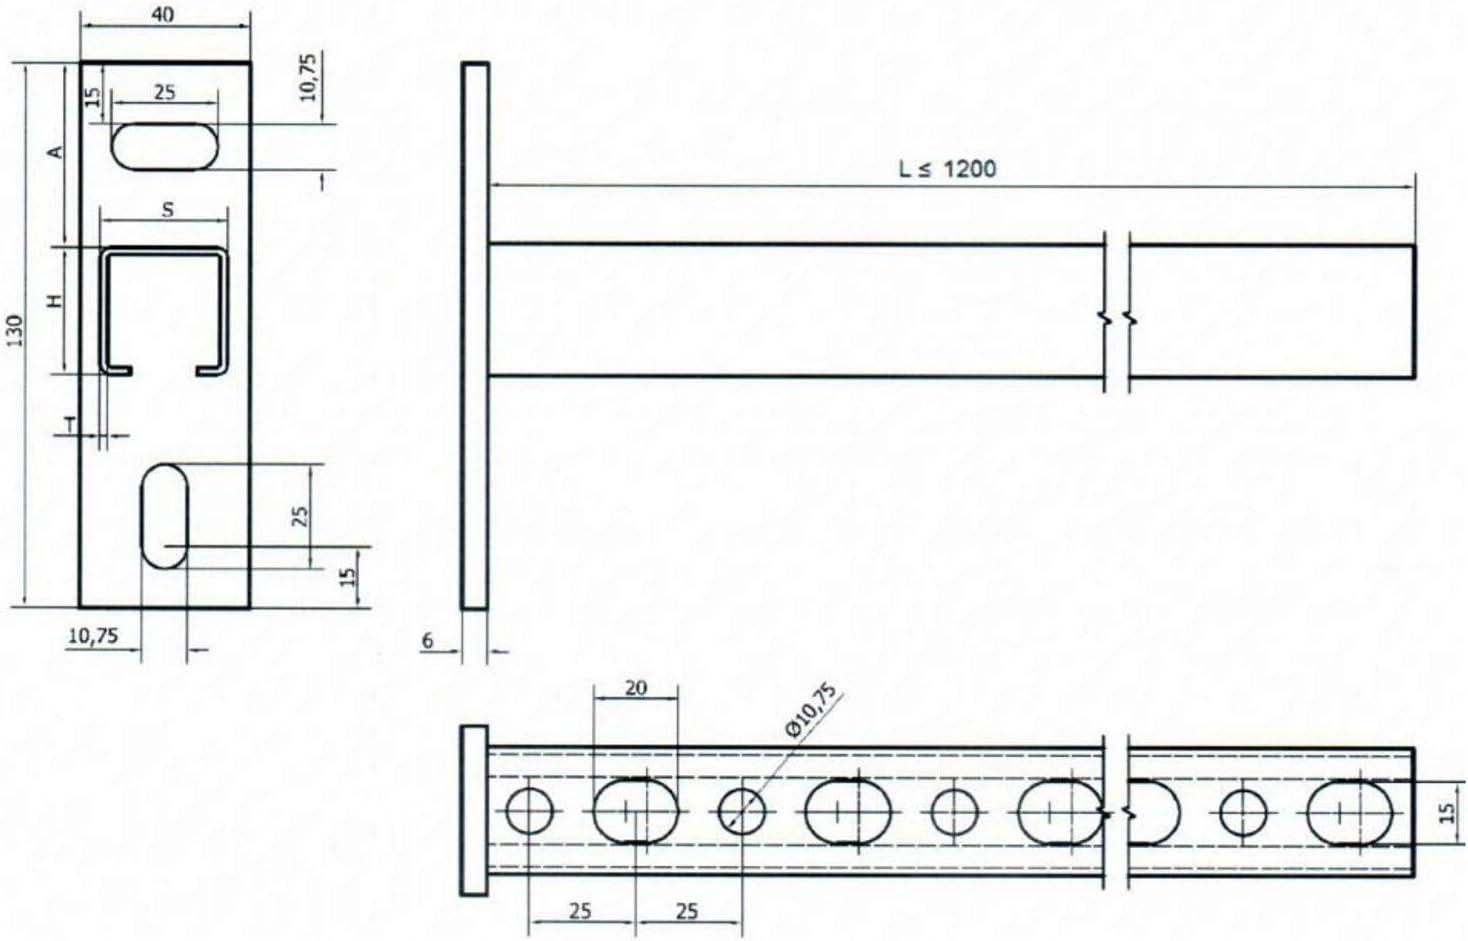 MKK 18067-001 Wandausleger Wandtr/äger Wandkonsole Winkel Schwerlasttr/äger Schwerlastwinkel 150 mm